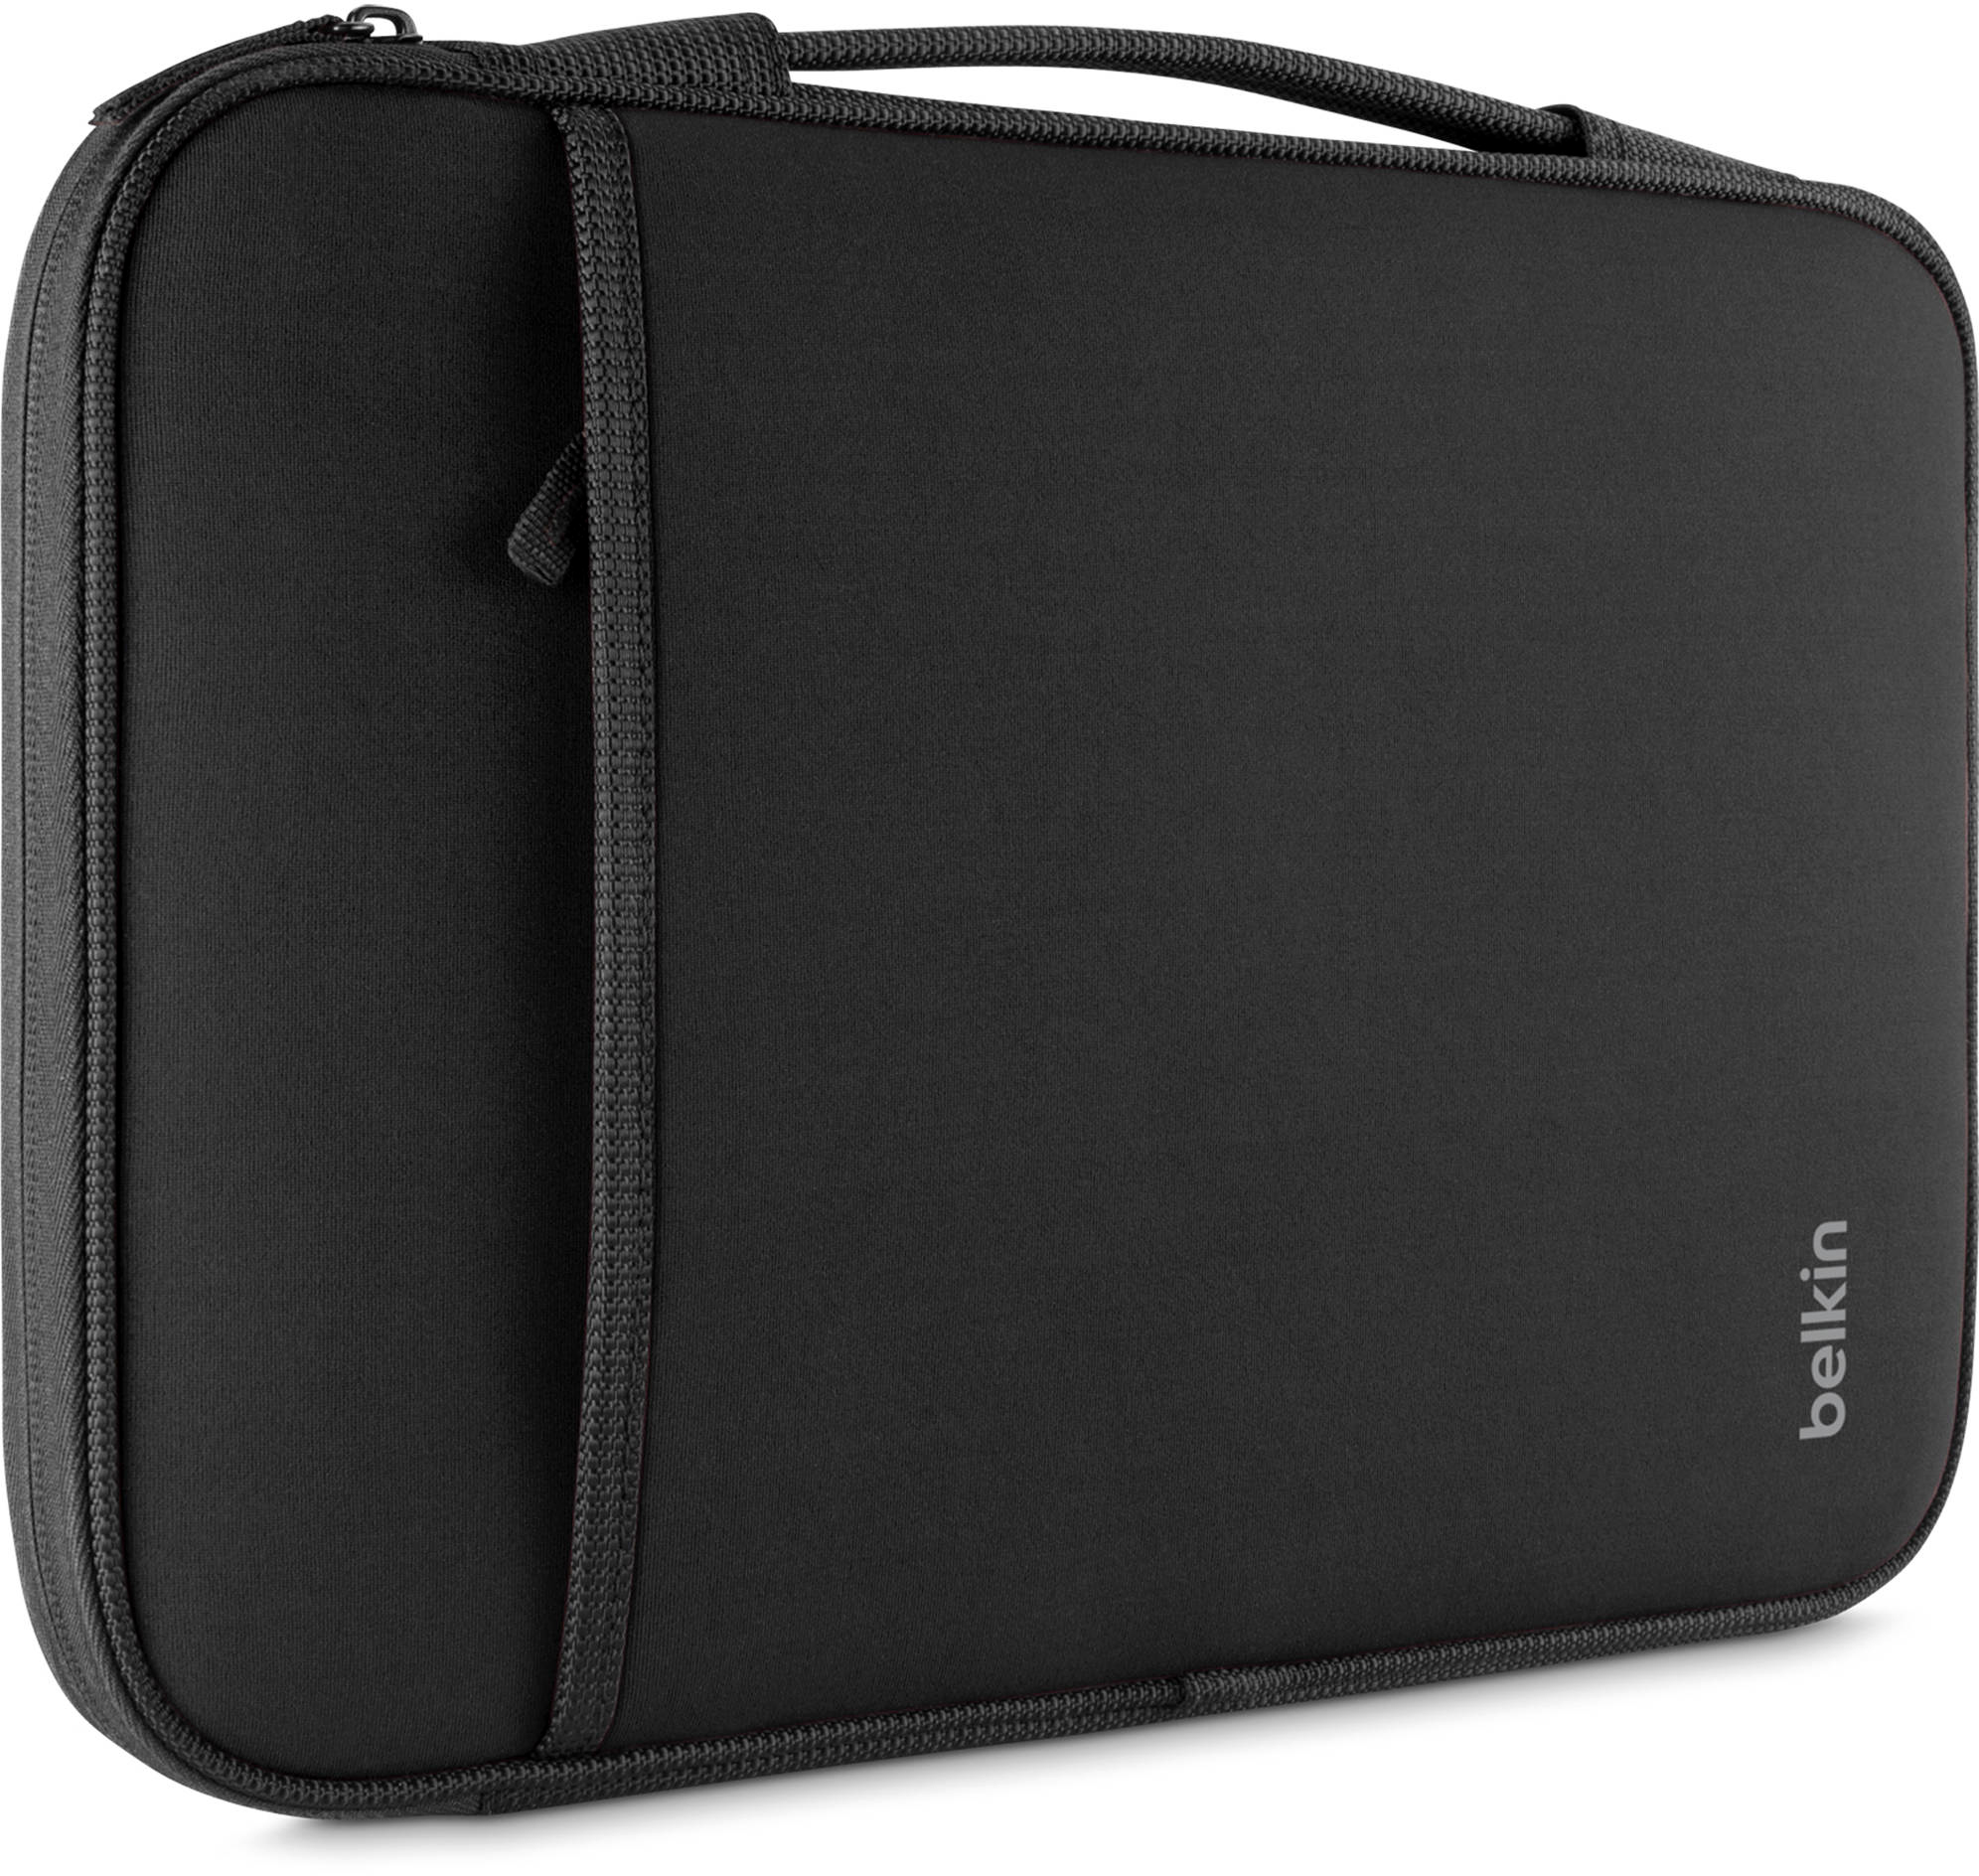 "Belkin Cover/Sleeve (B2B075-C00) - сумка для ноутбука 14"" (Black)  цена"